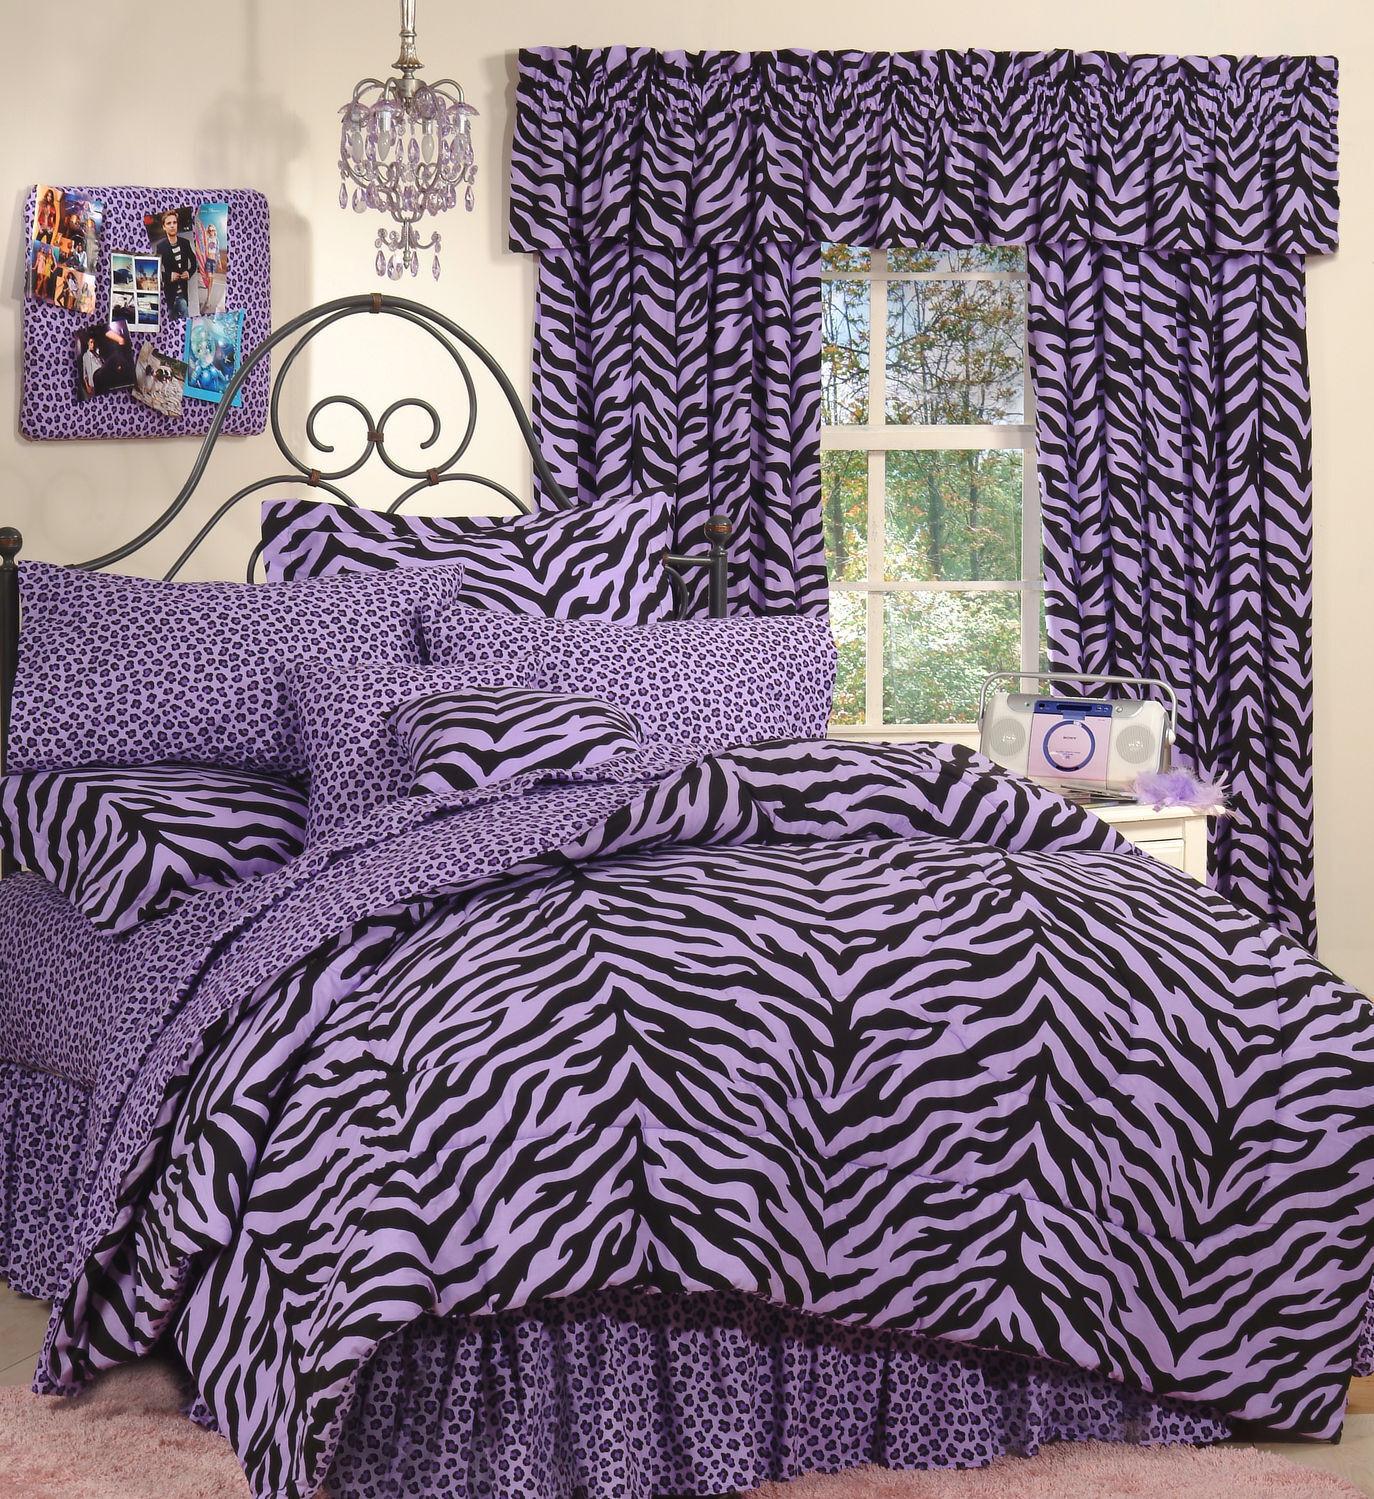 lila Zebra Leopard - Safari Print  6 Pc EXTRA LONG TWIN Comforter Bedding Set